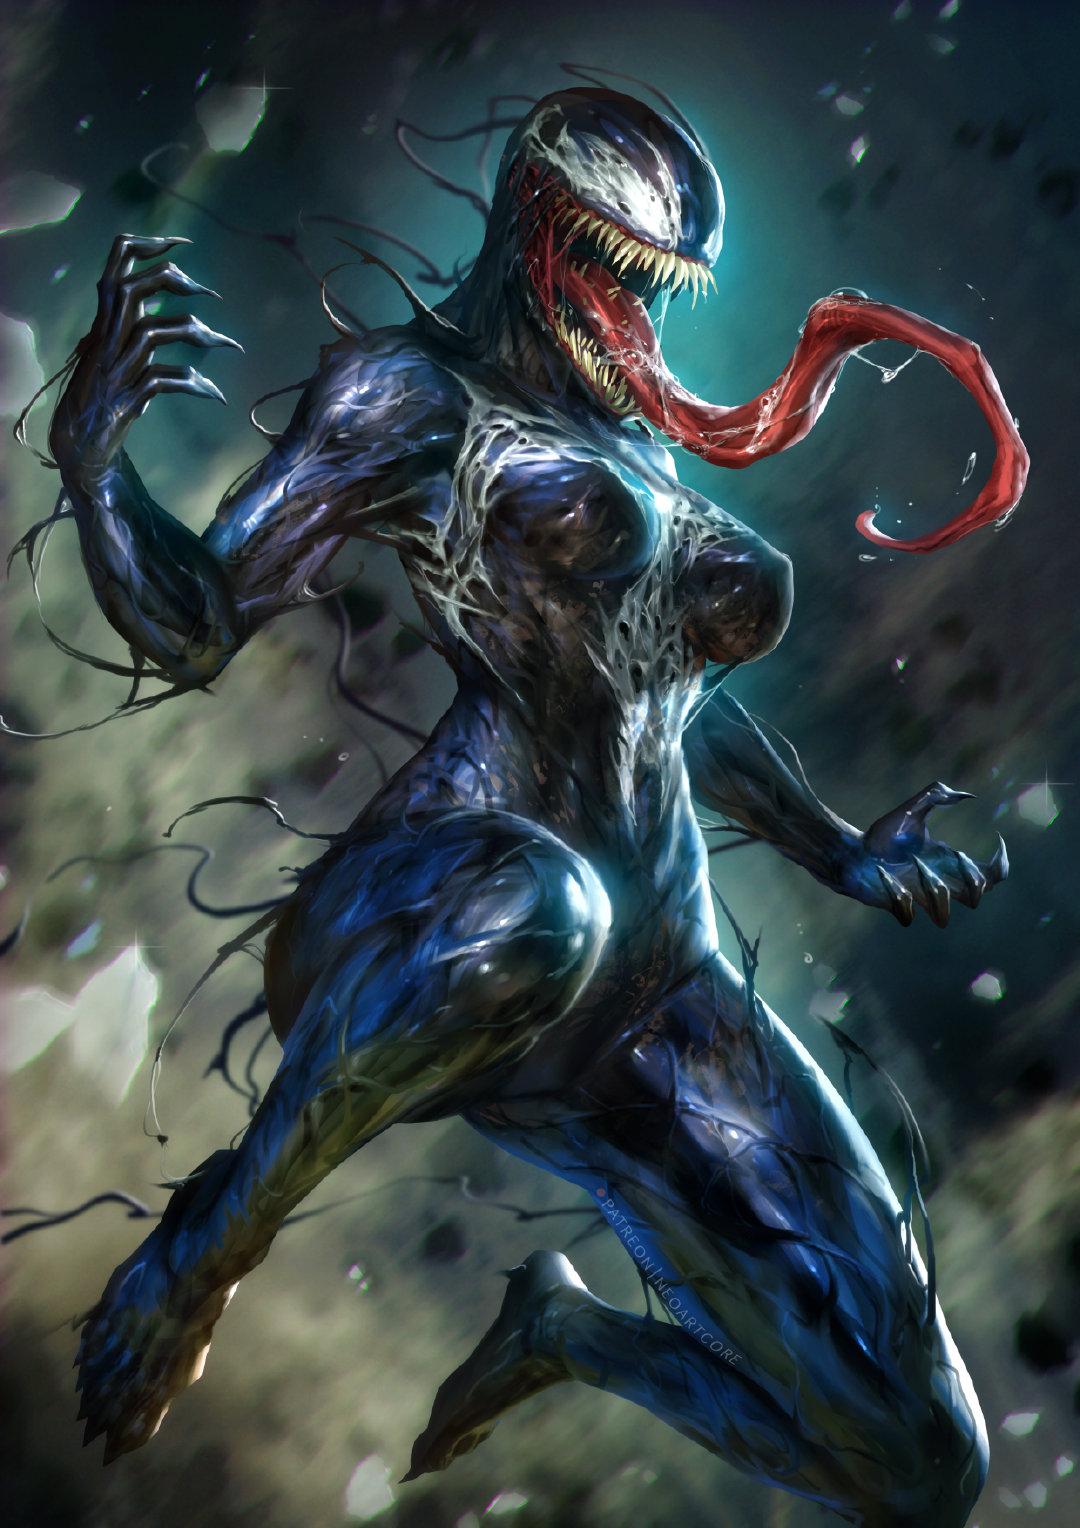 She Venom-毒液